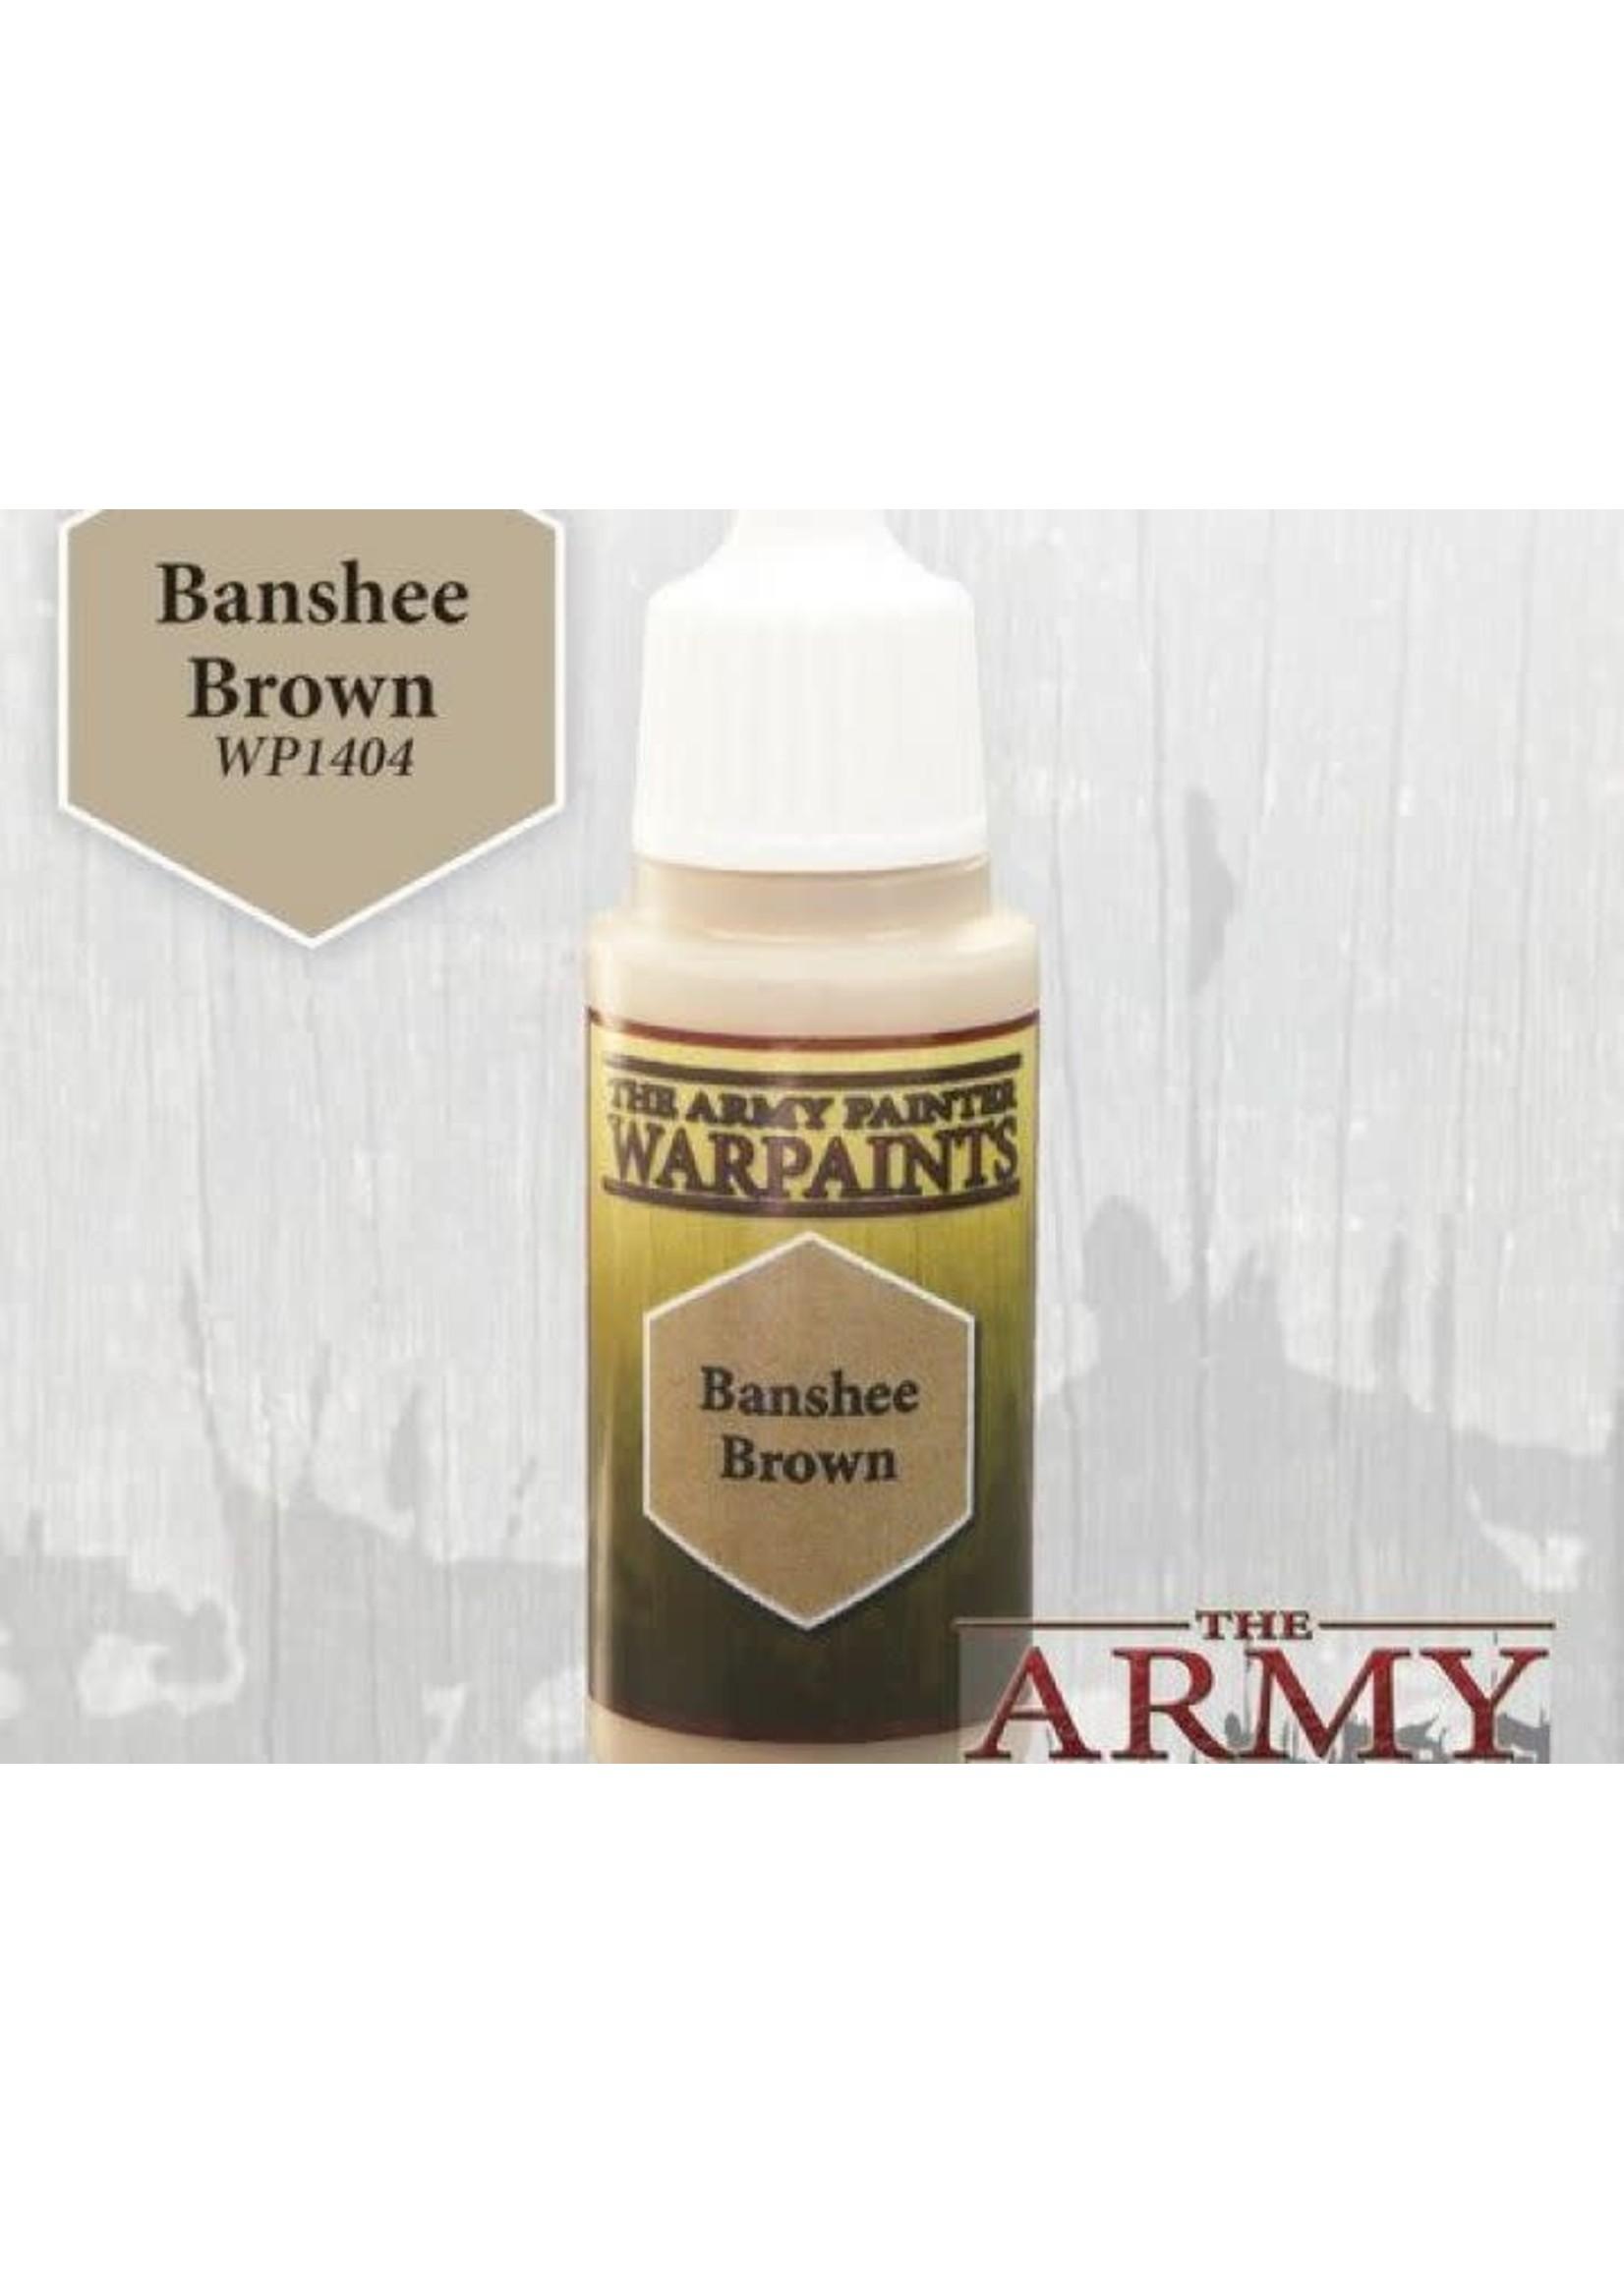 Army Painter Warpaints - Banshee Brown